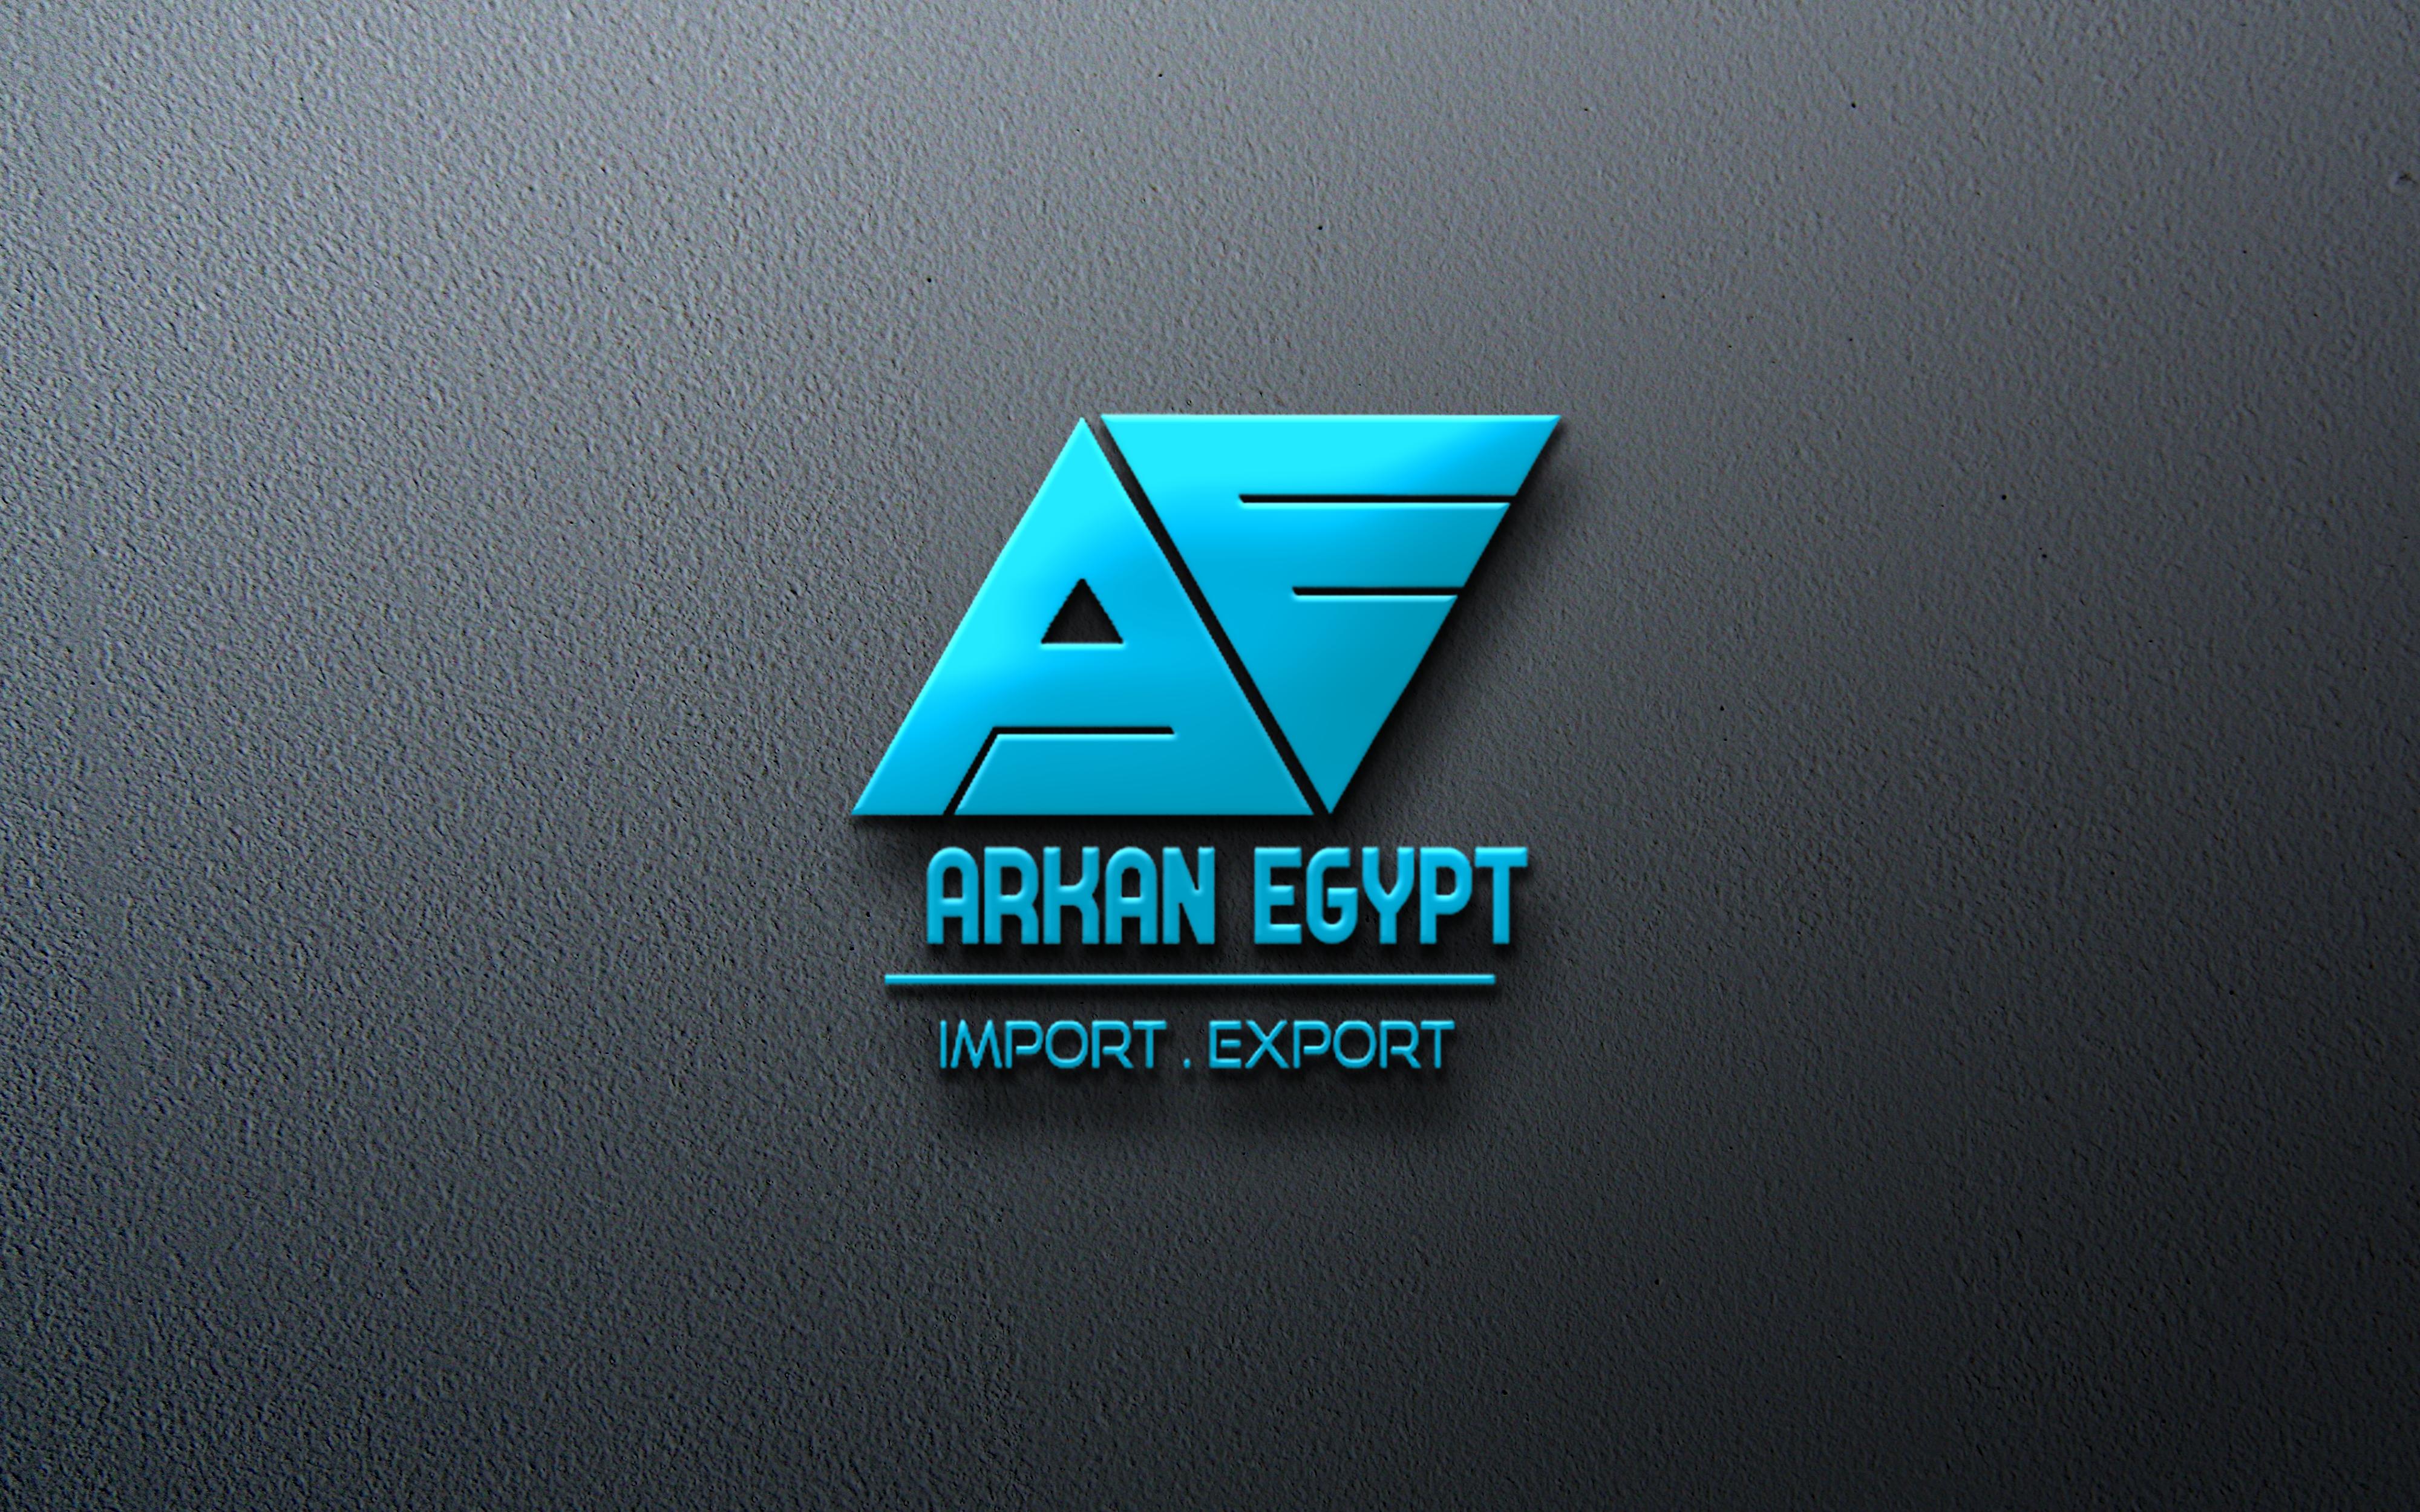 Pin By Raya وكالة راية الرواد On Logos In 2020 Enamel Pins Egypt Logos